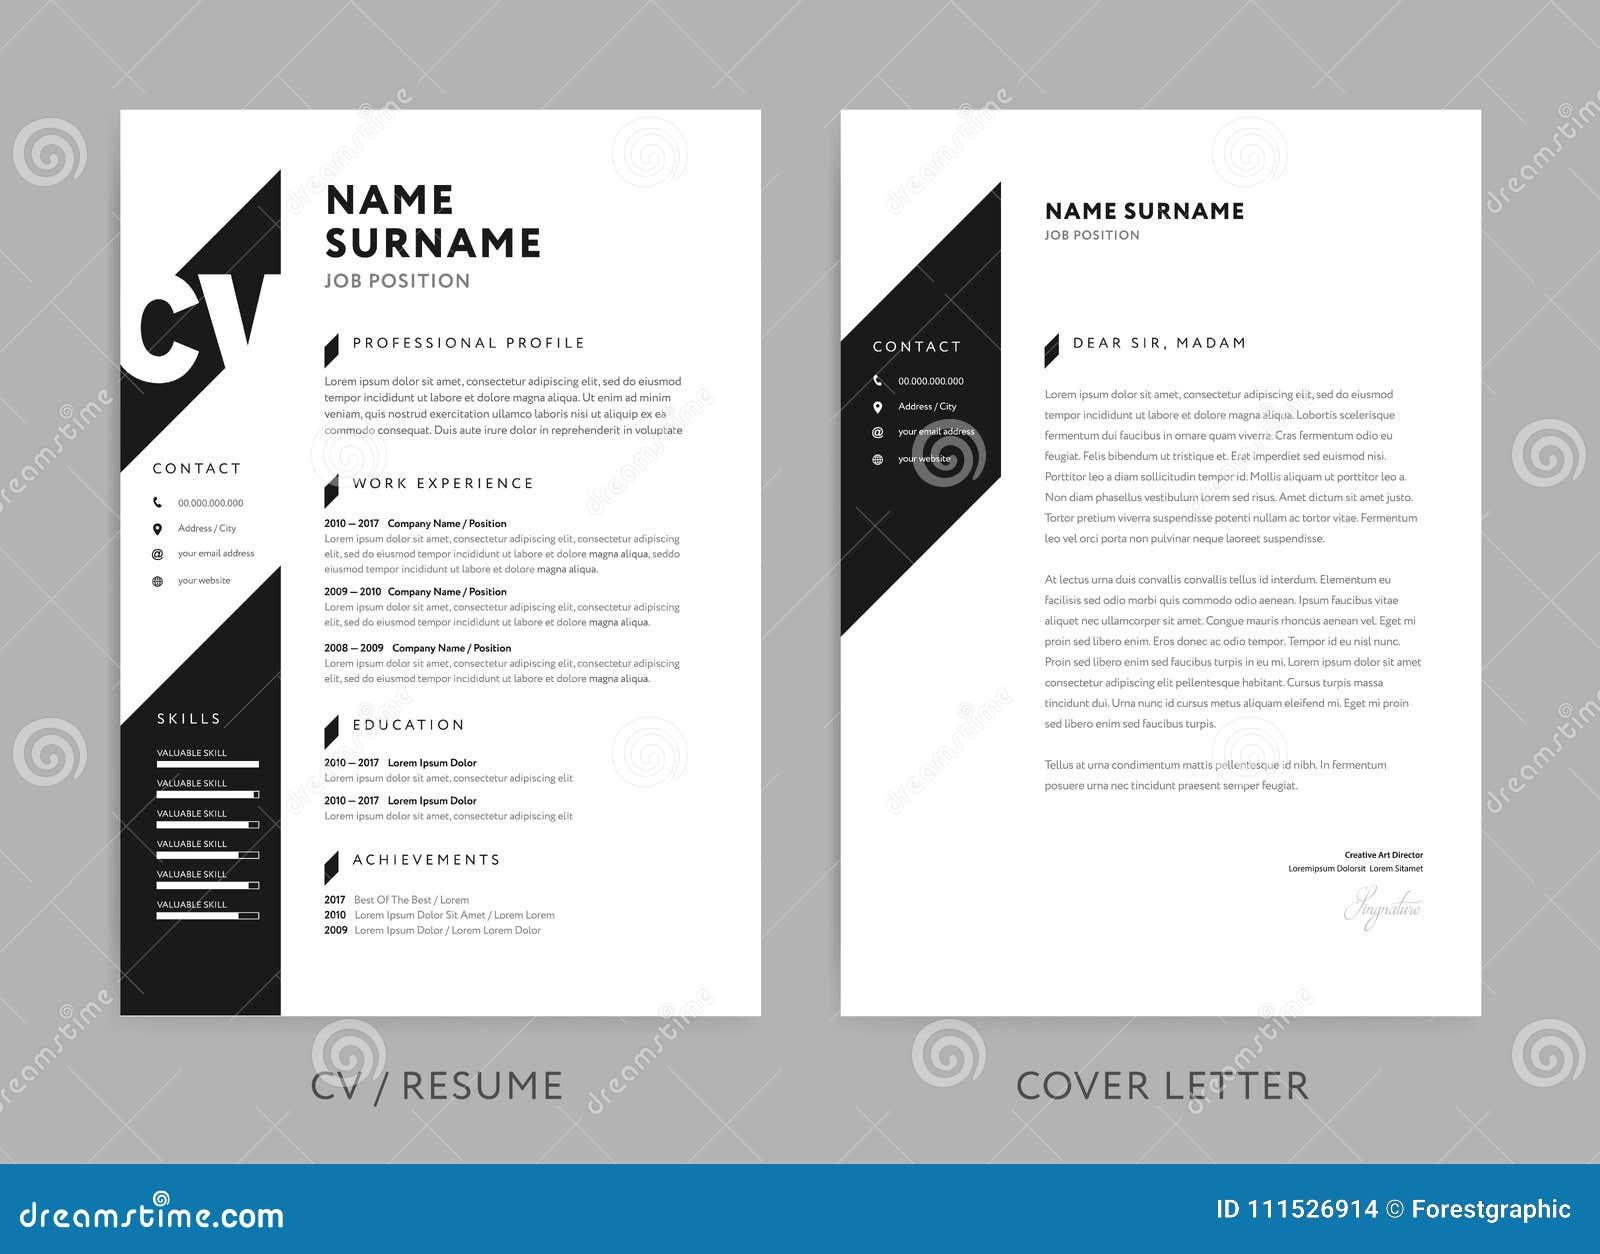 cv de minimaliste  r u00e9sum u00e9 et lettre d u0026 39 accompagnement - conception minimale